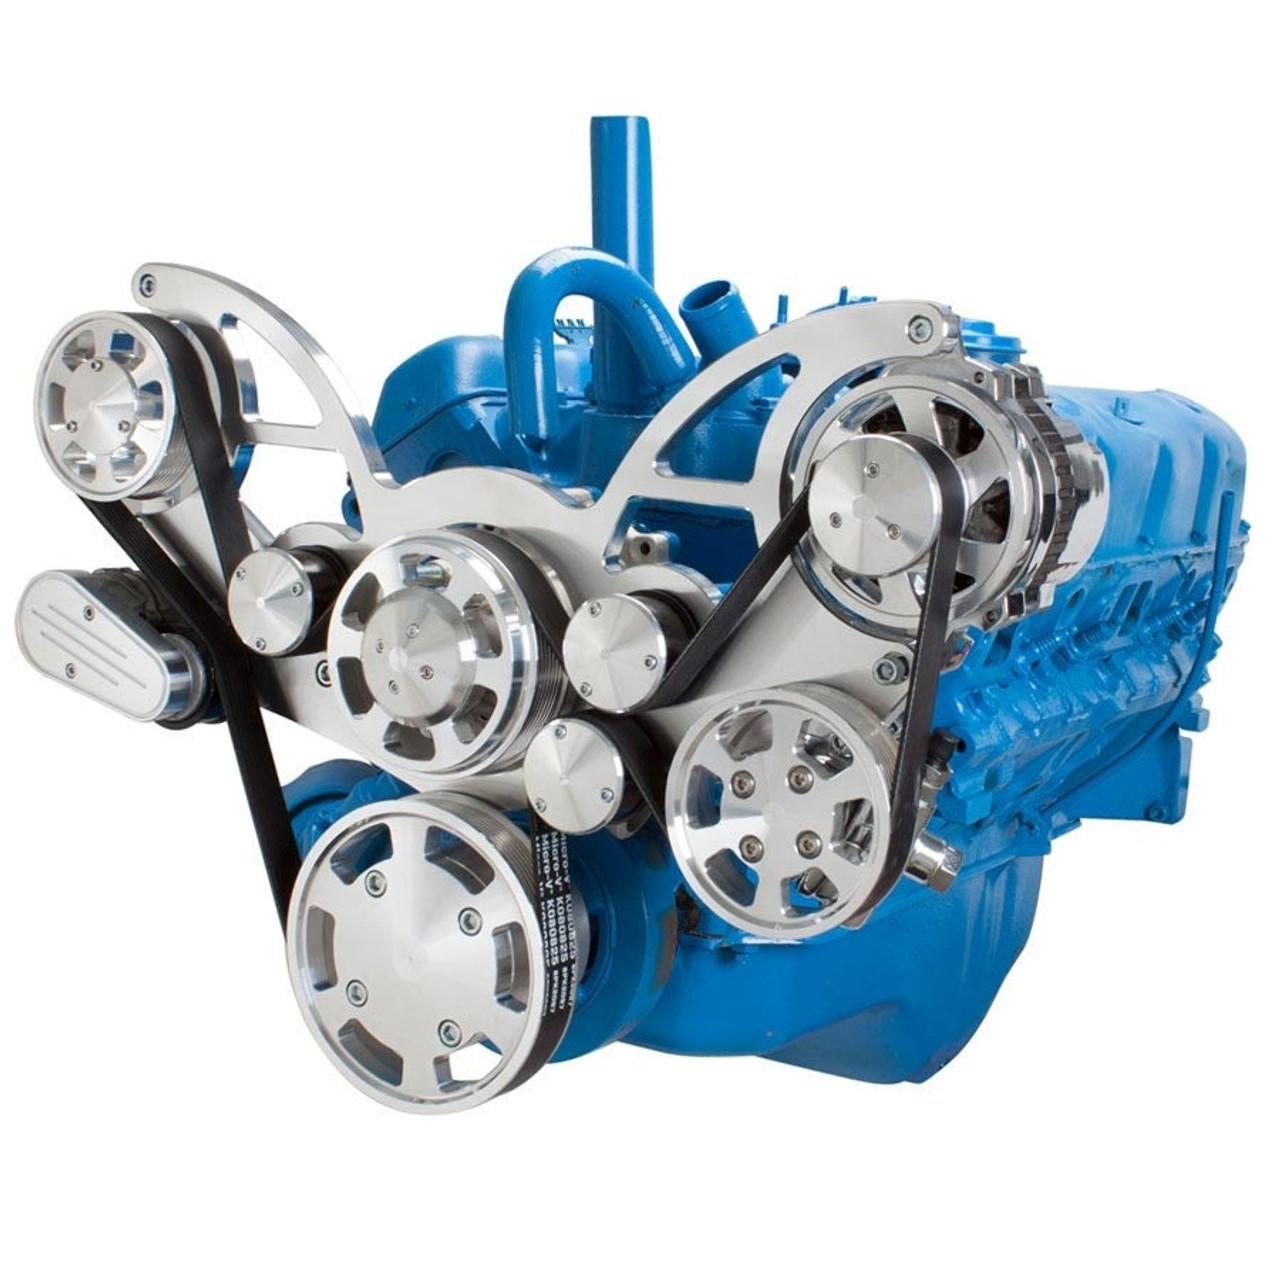 hight resolution of serpentine system for amc jeep 306 360 401 power steering alternator